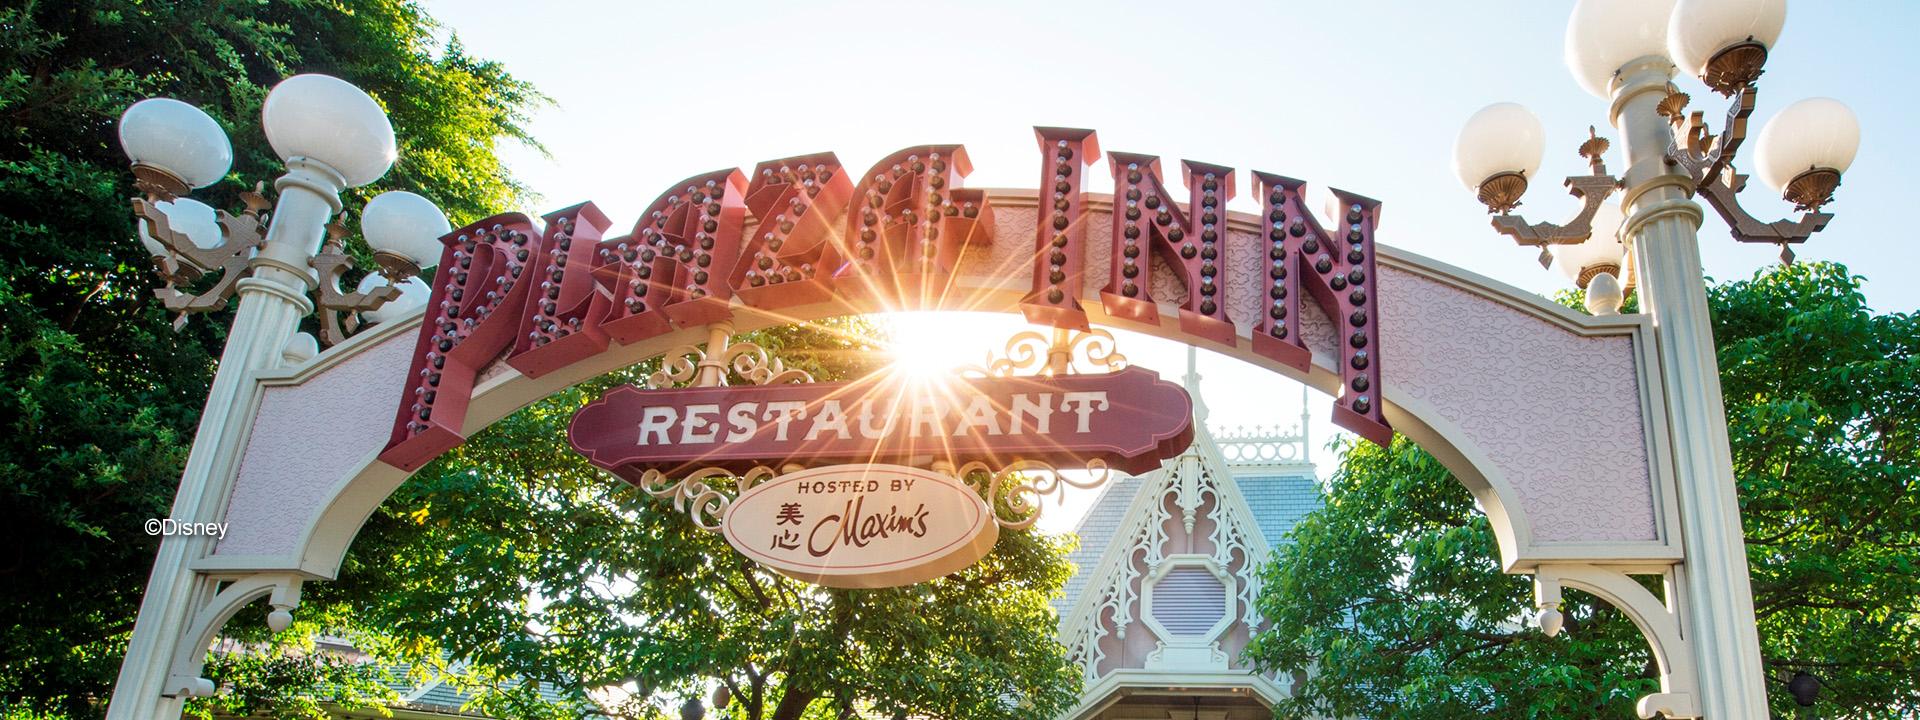 Hong Kong Disneyland 2 In 1 Meal Coupon With Exclusive Discount Klook Voucher Hongkong